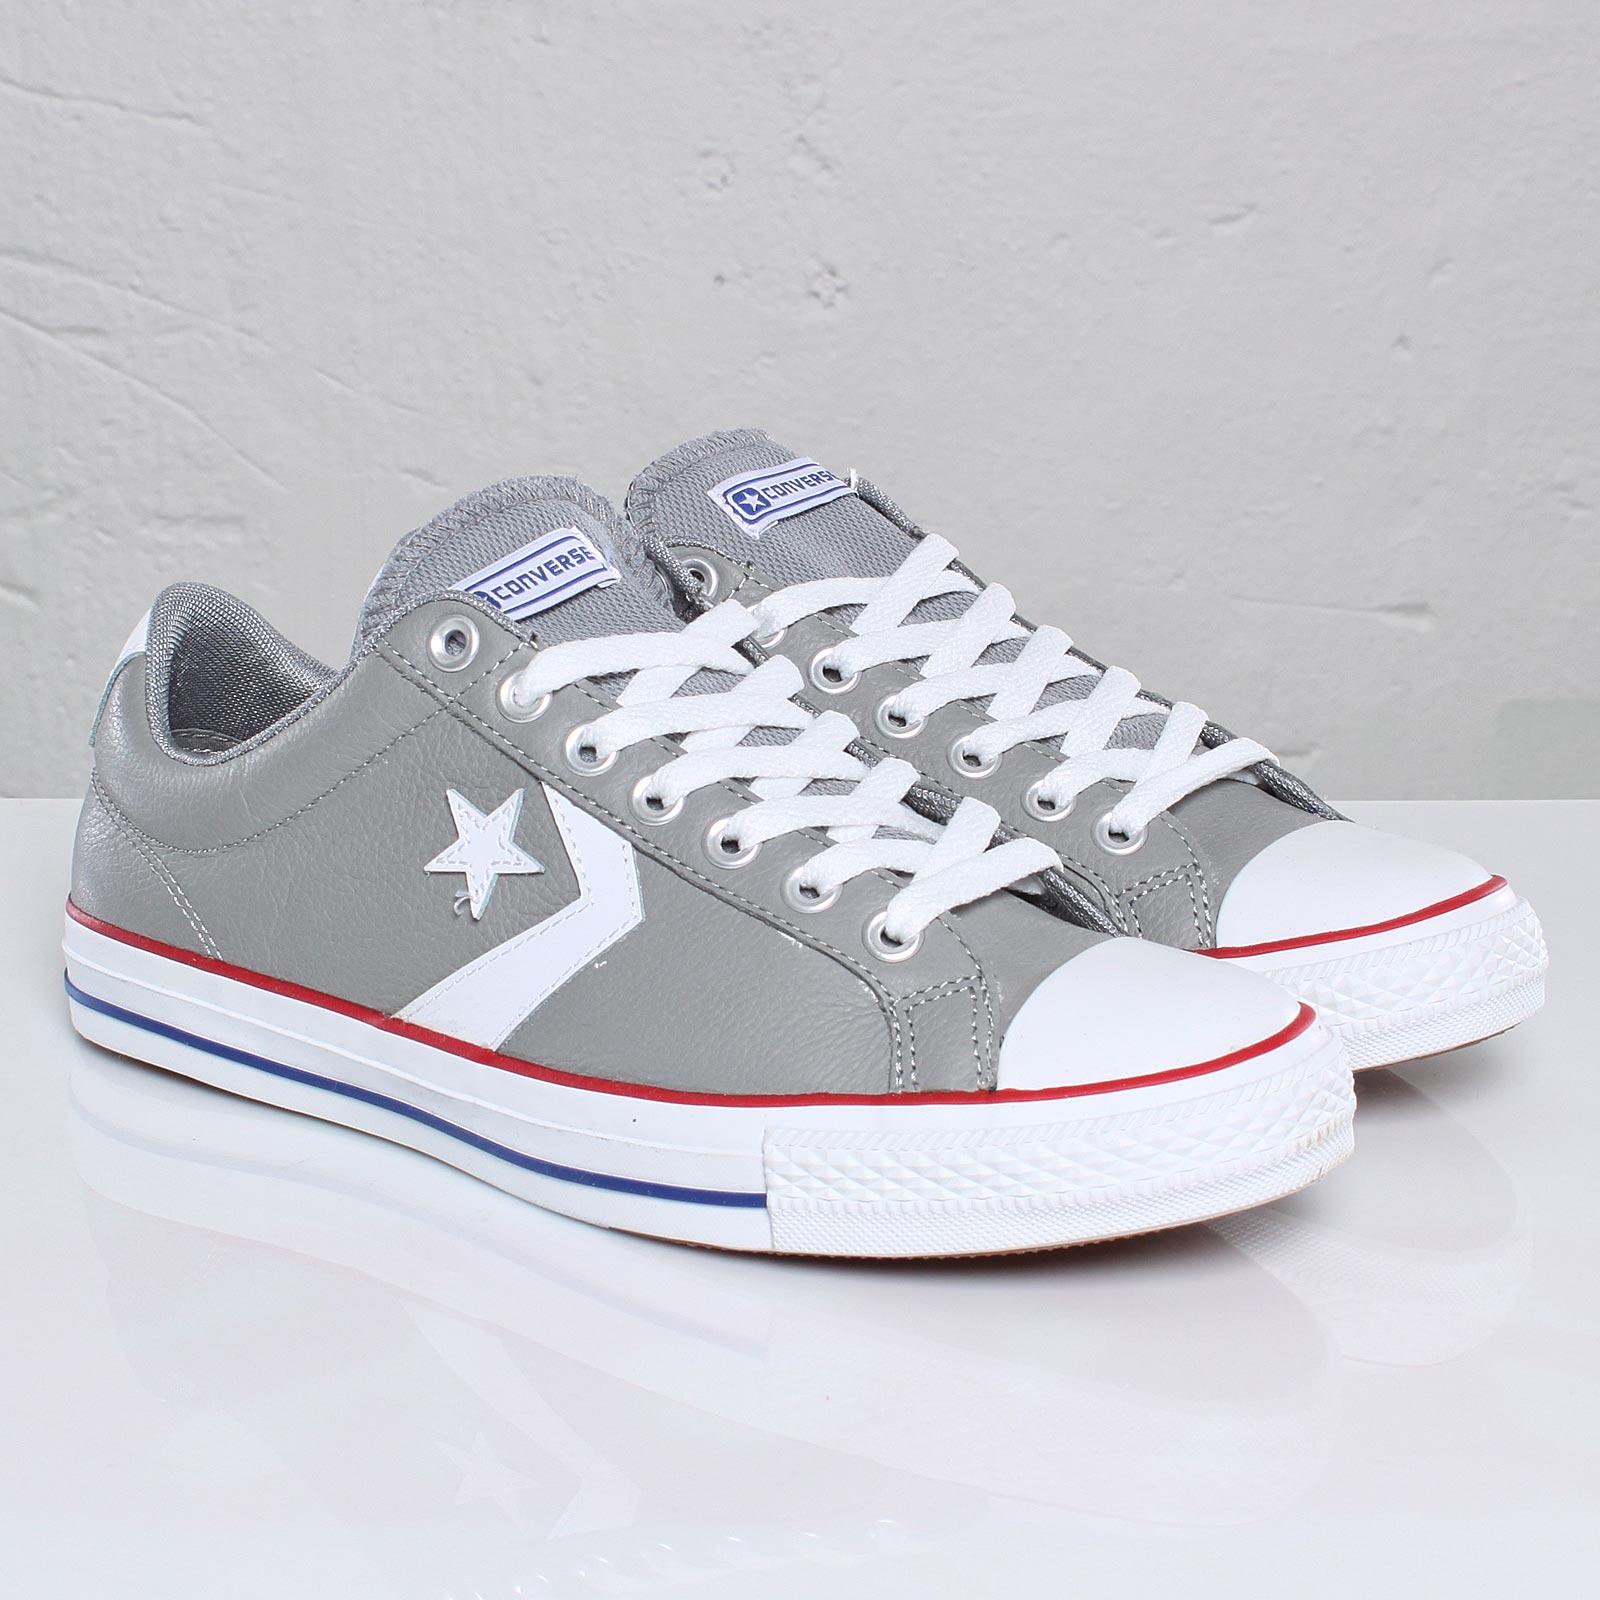 ca4e837d4e88 Converse Star Player EV Ox - 100839 - Sneakersnstuff